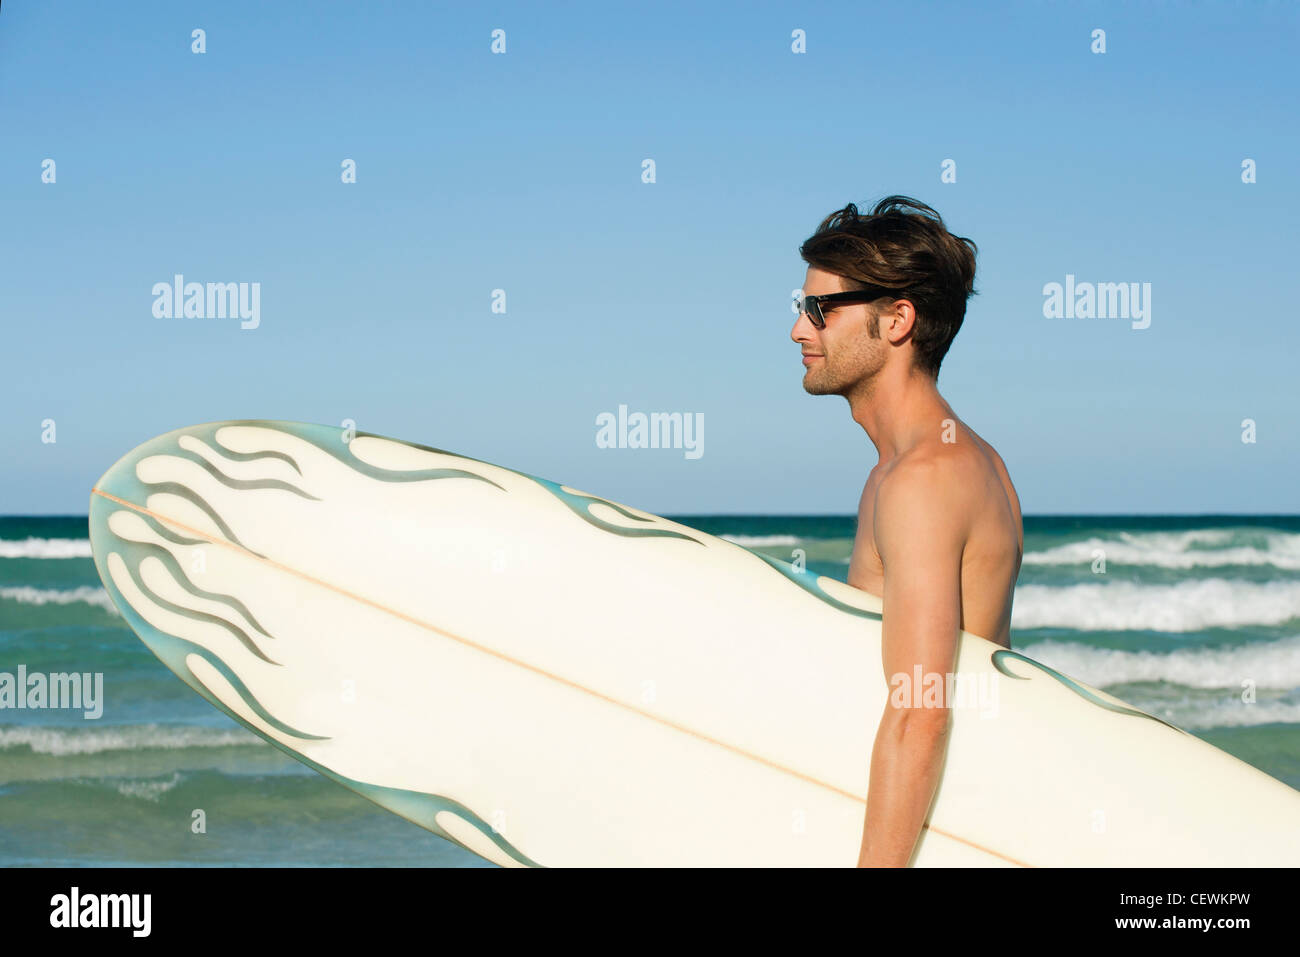 Mann mit Surfbrett am Strand Stockbild